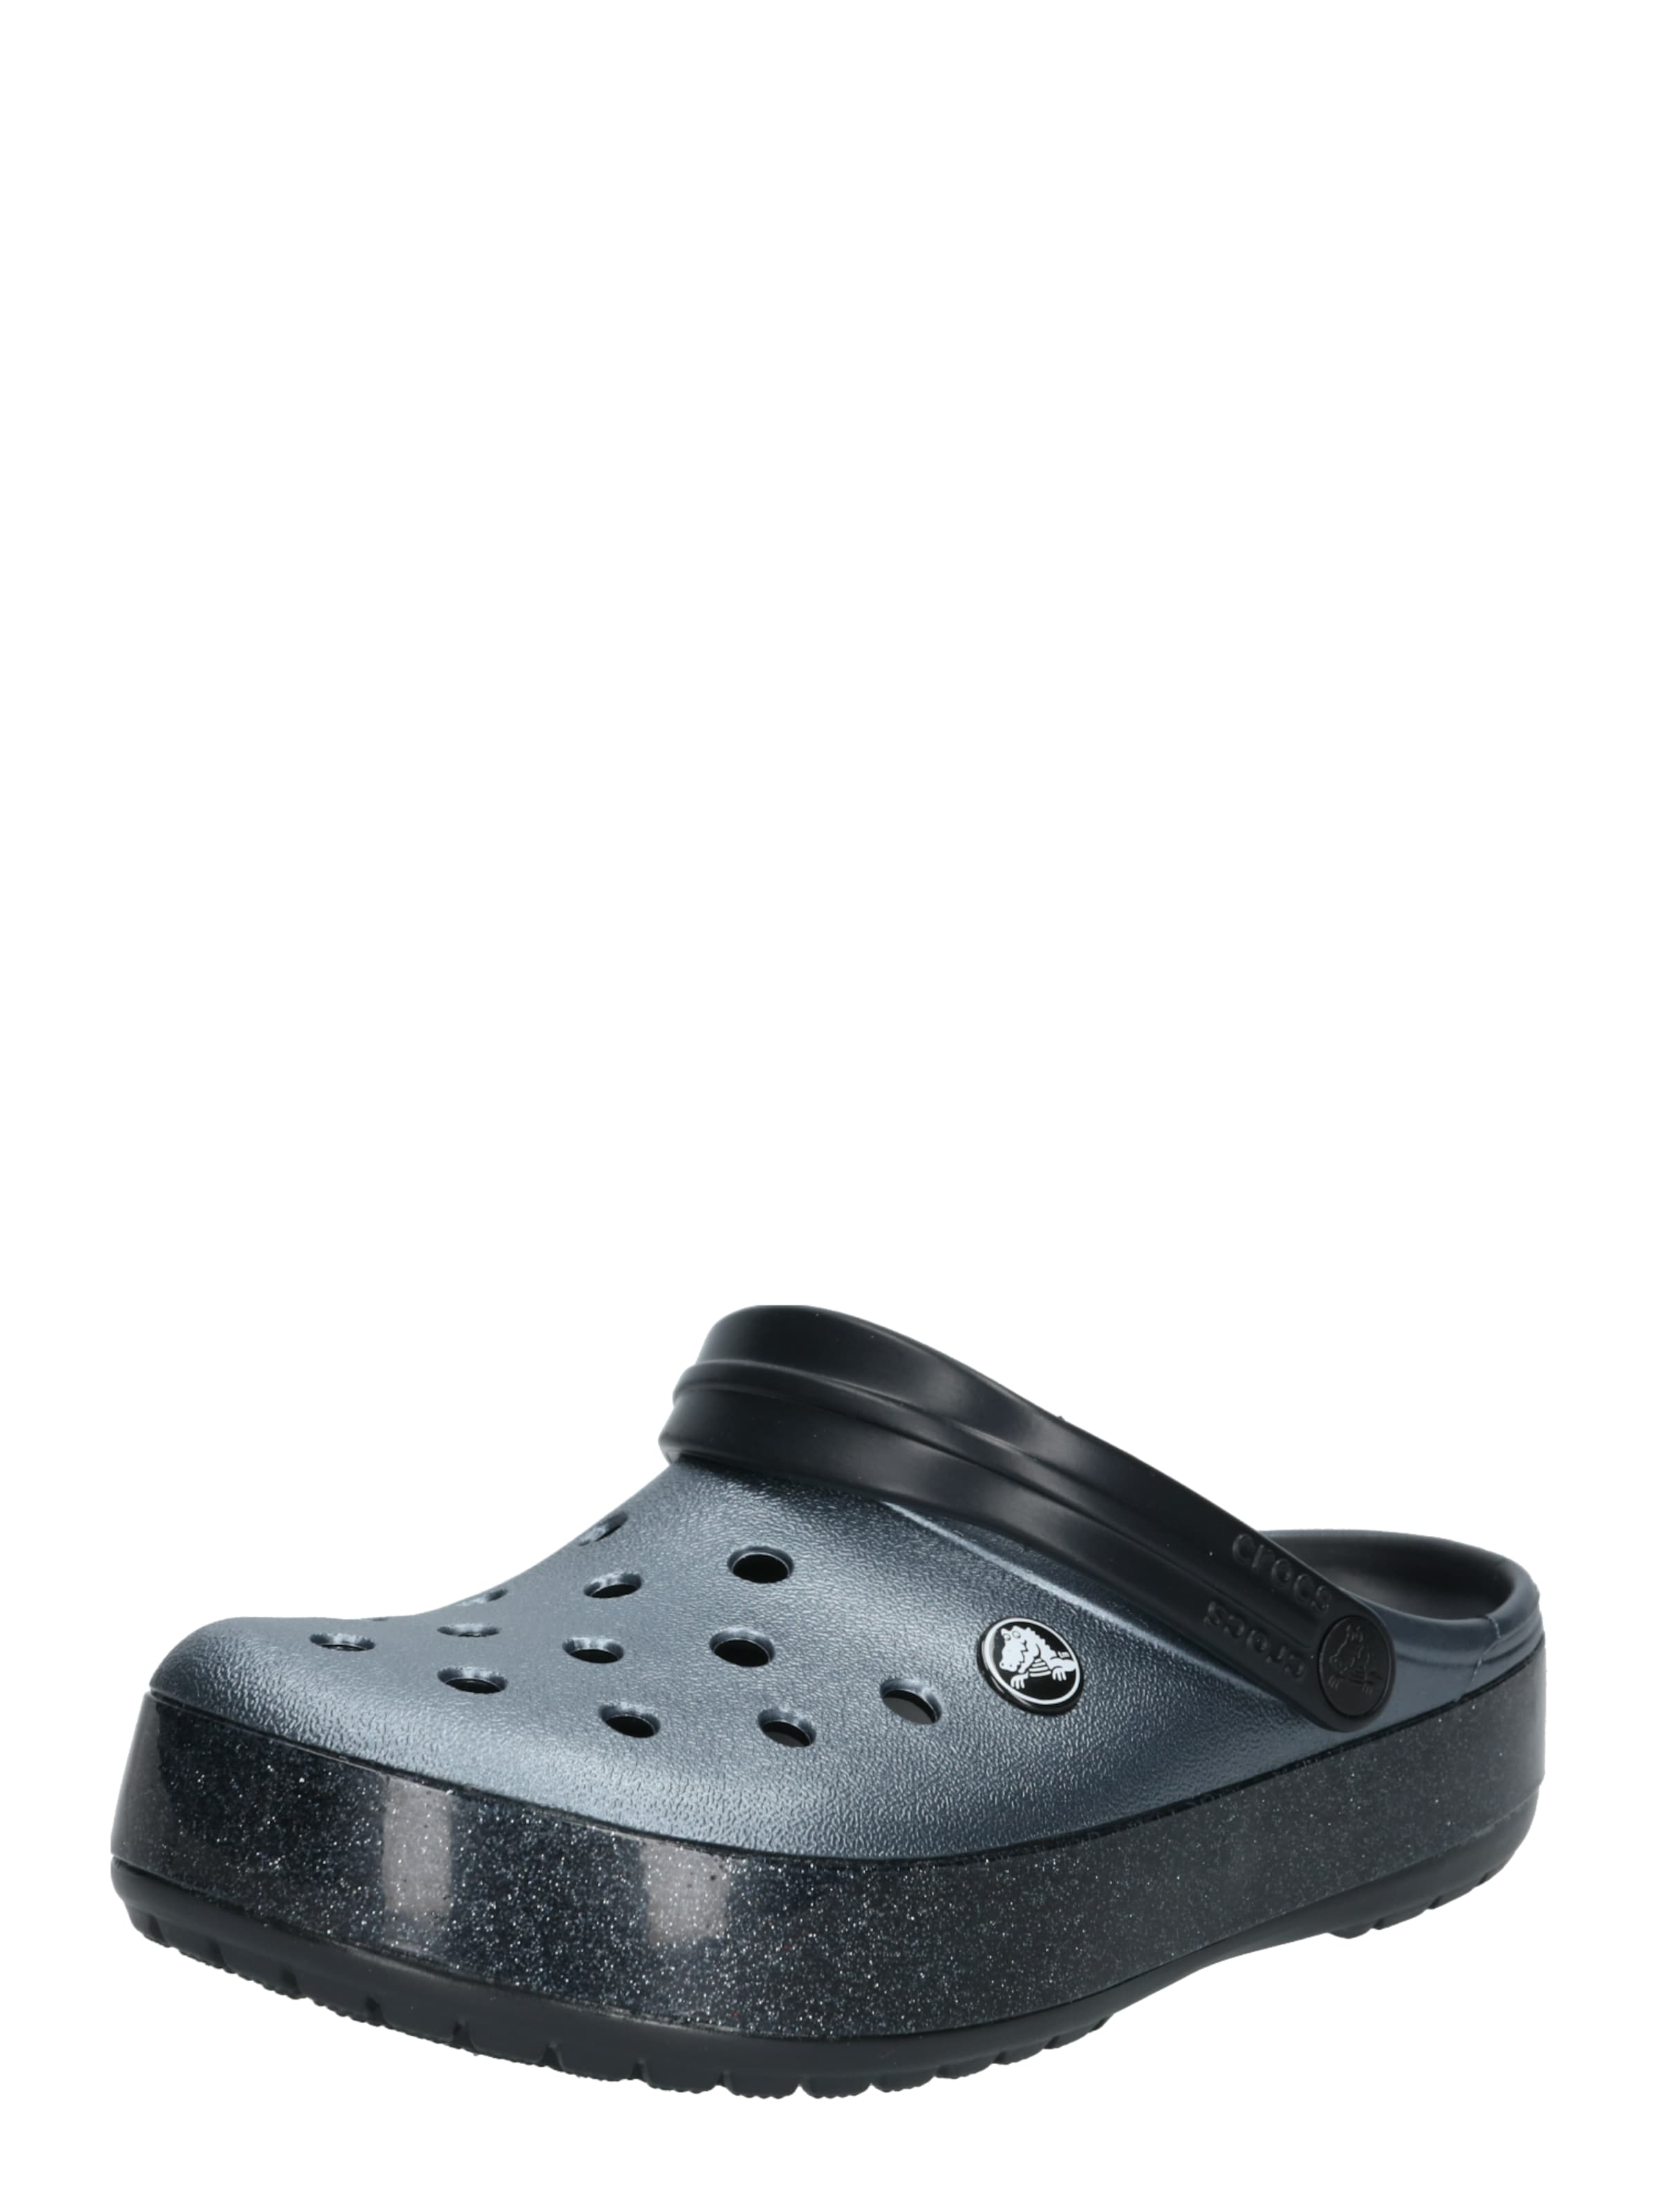 Sabots En Clog' Noir Printed Crocs 'crocband iPkXOZu